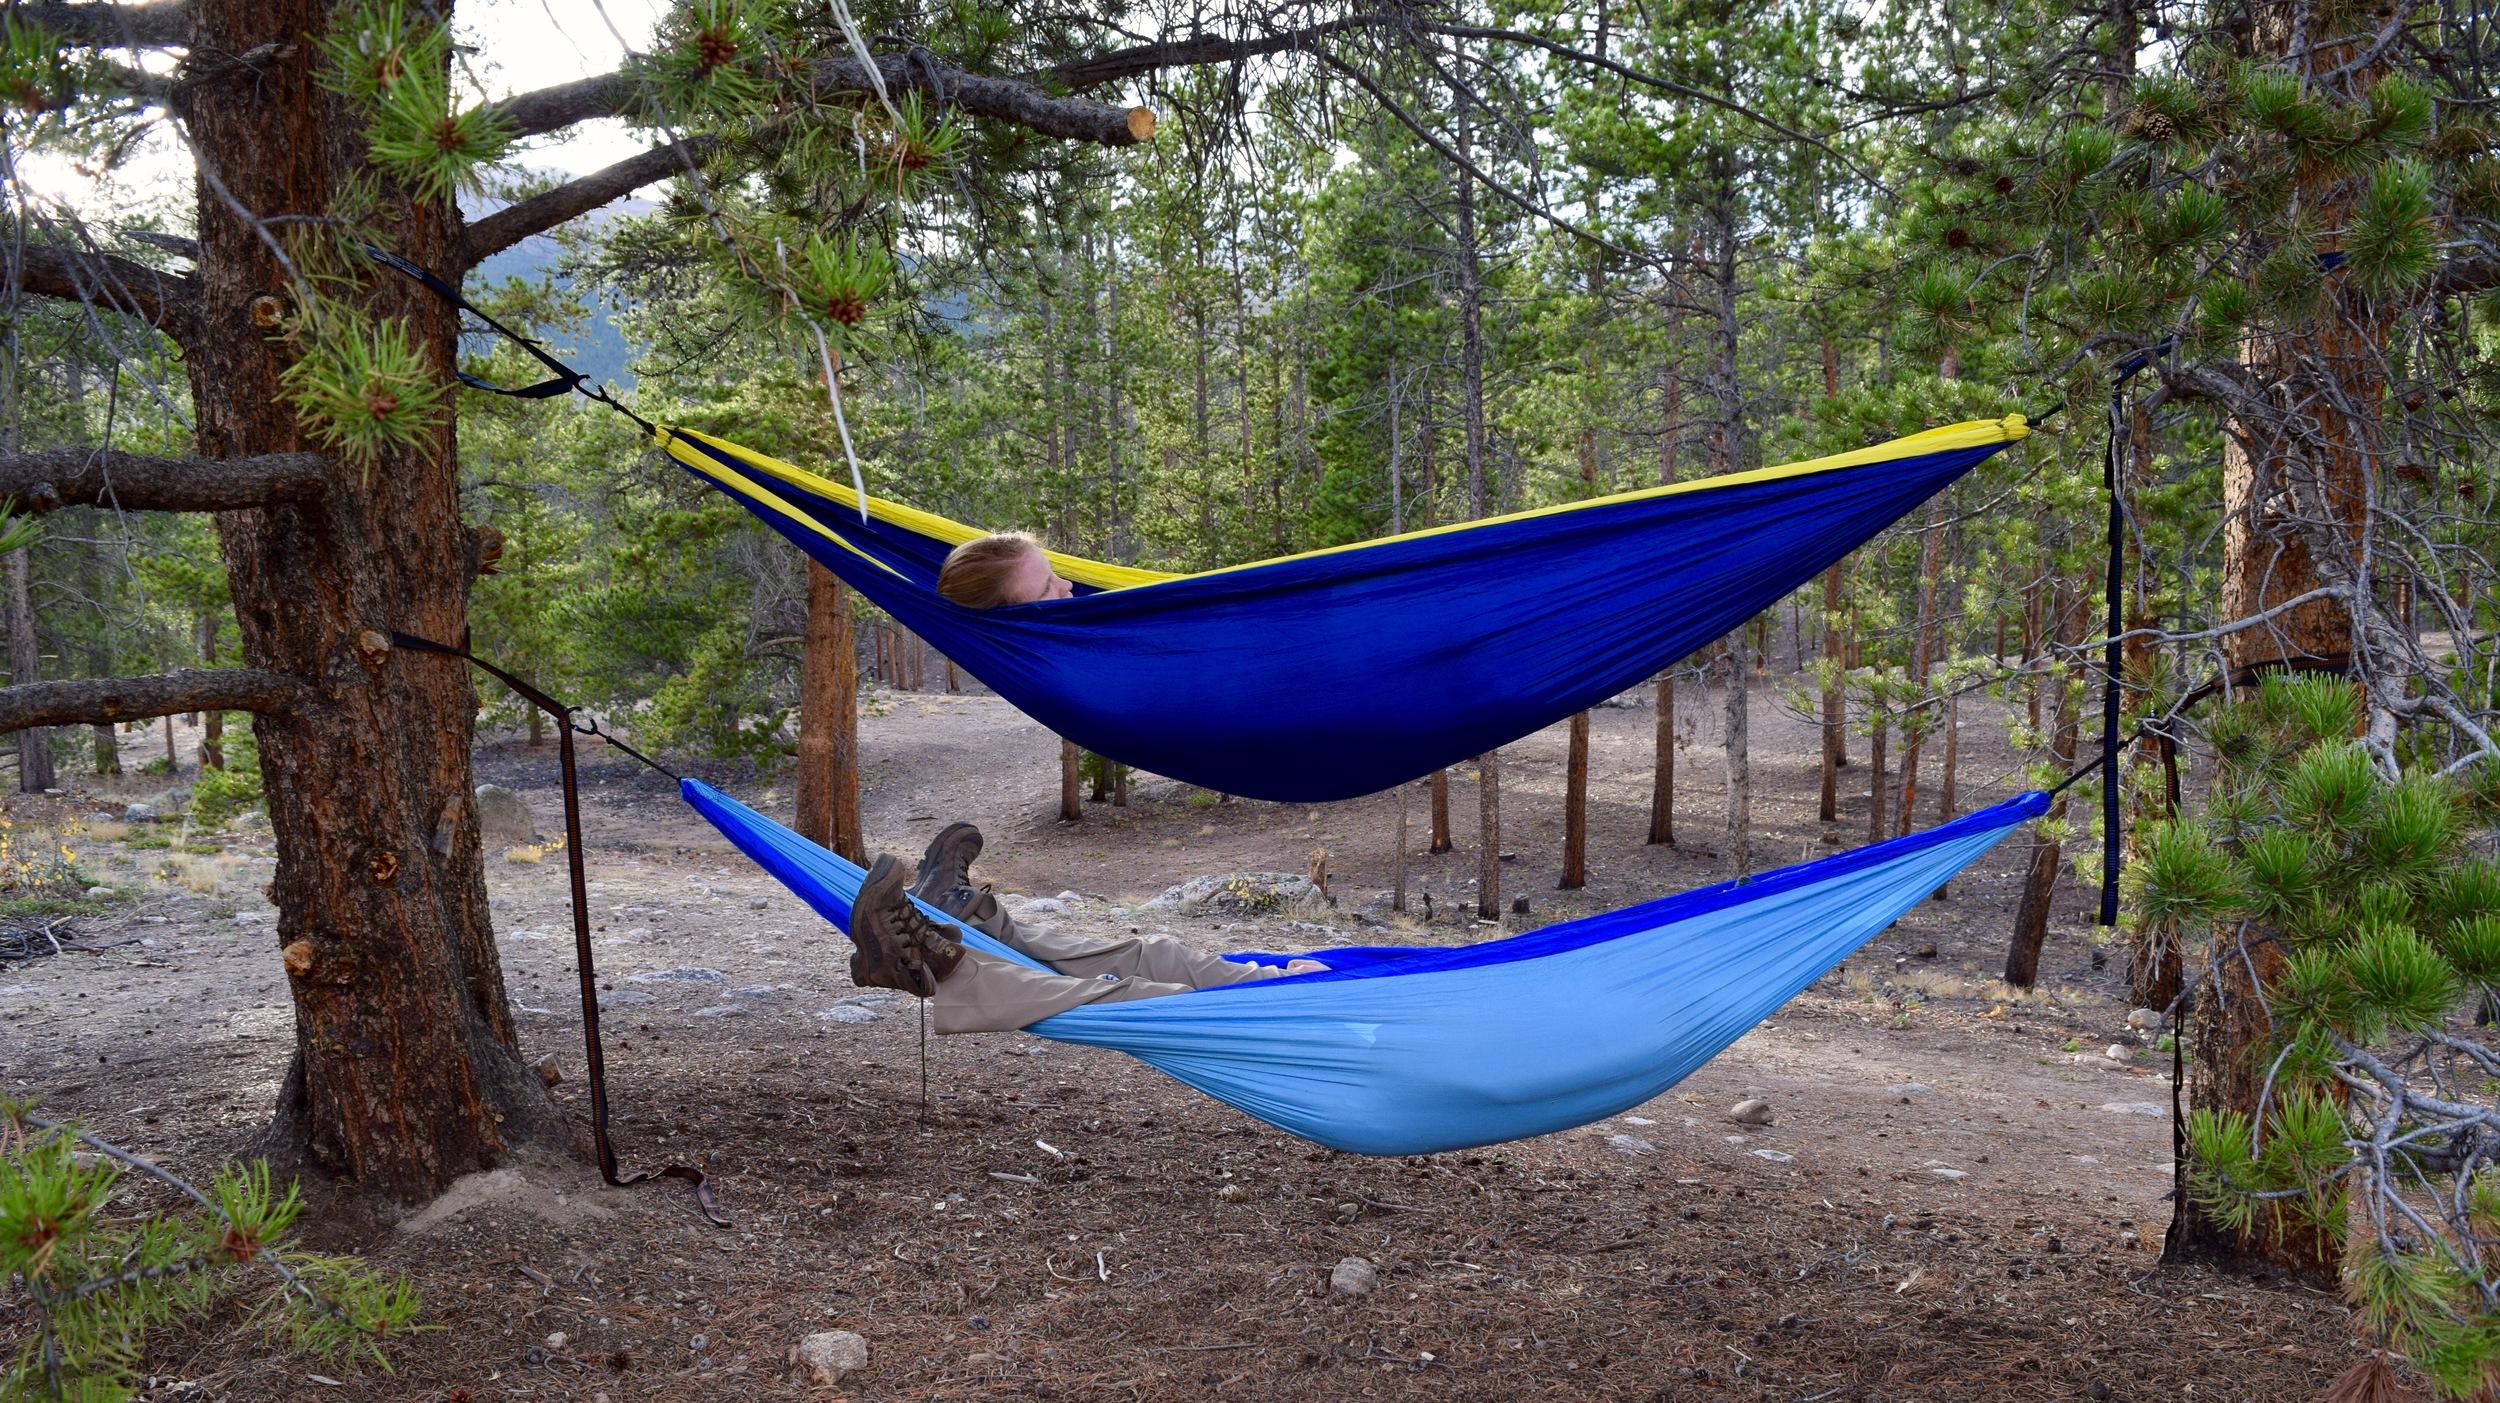 Bunkbed hammocks. Best way to hammock.